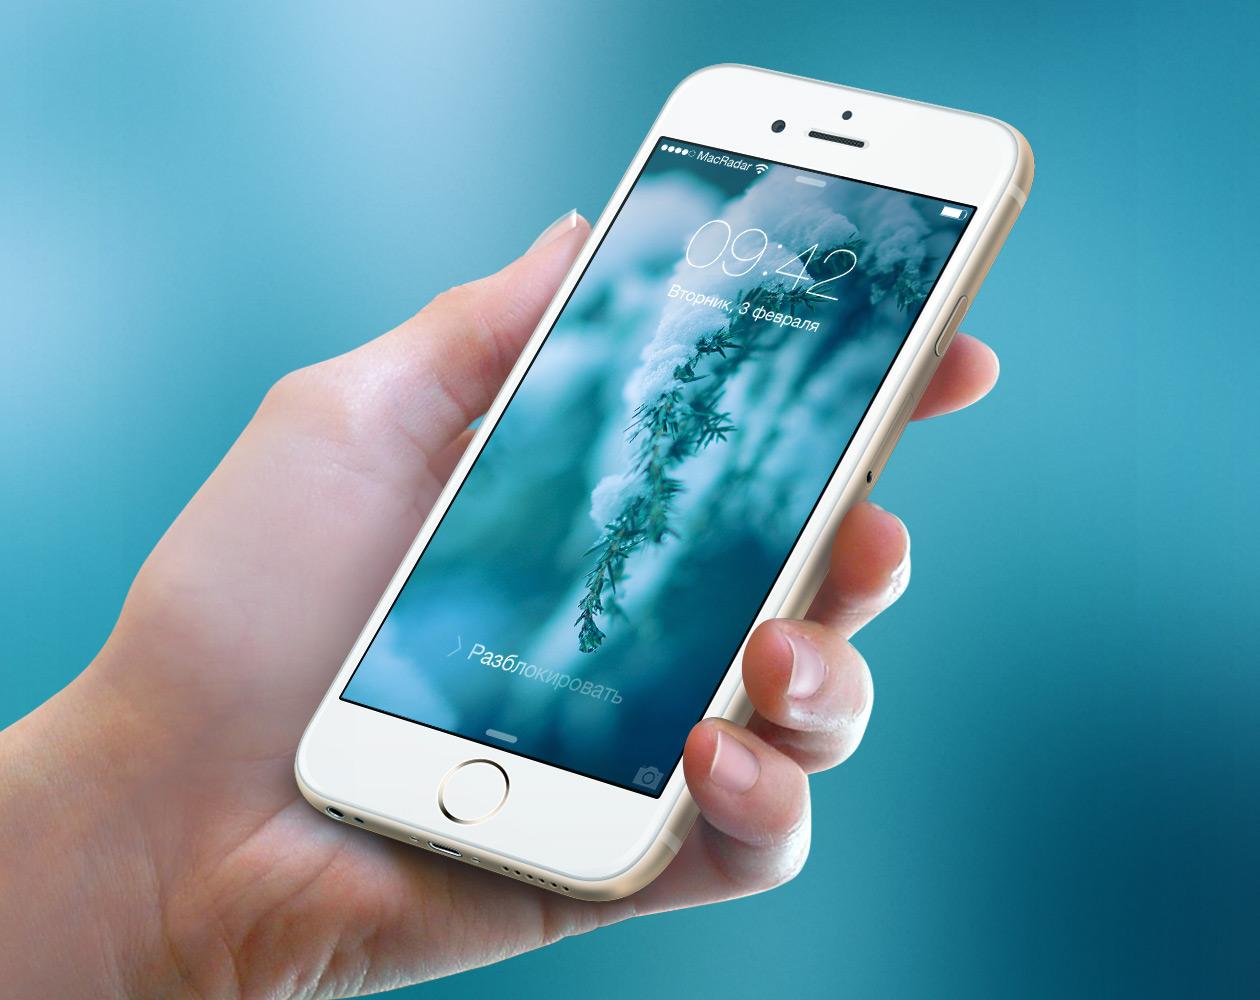 Обои для iPhone: Эх, зимушка-зима!